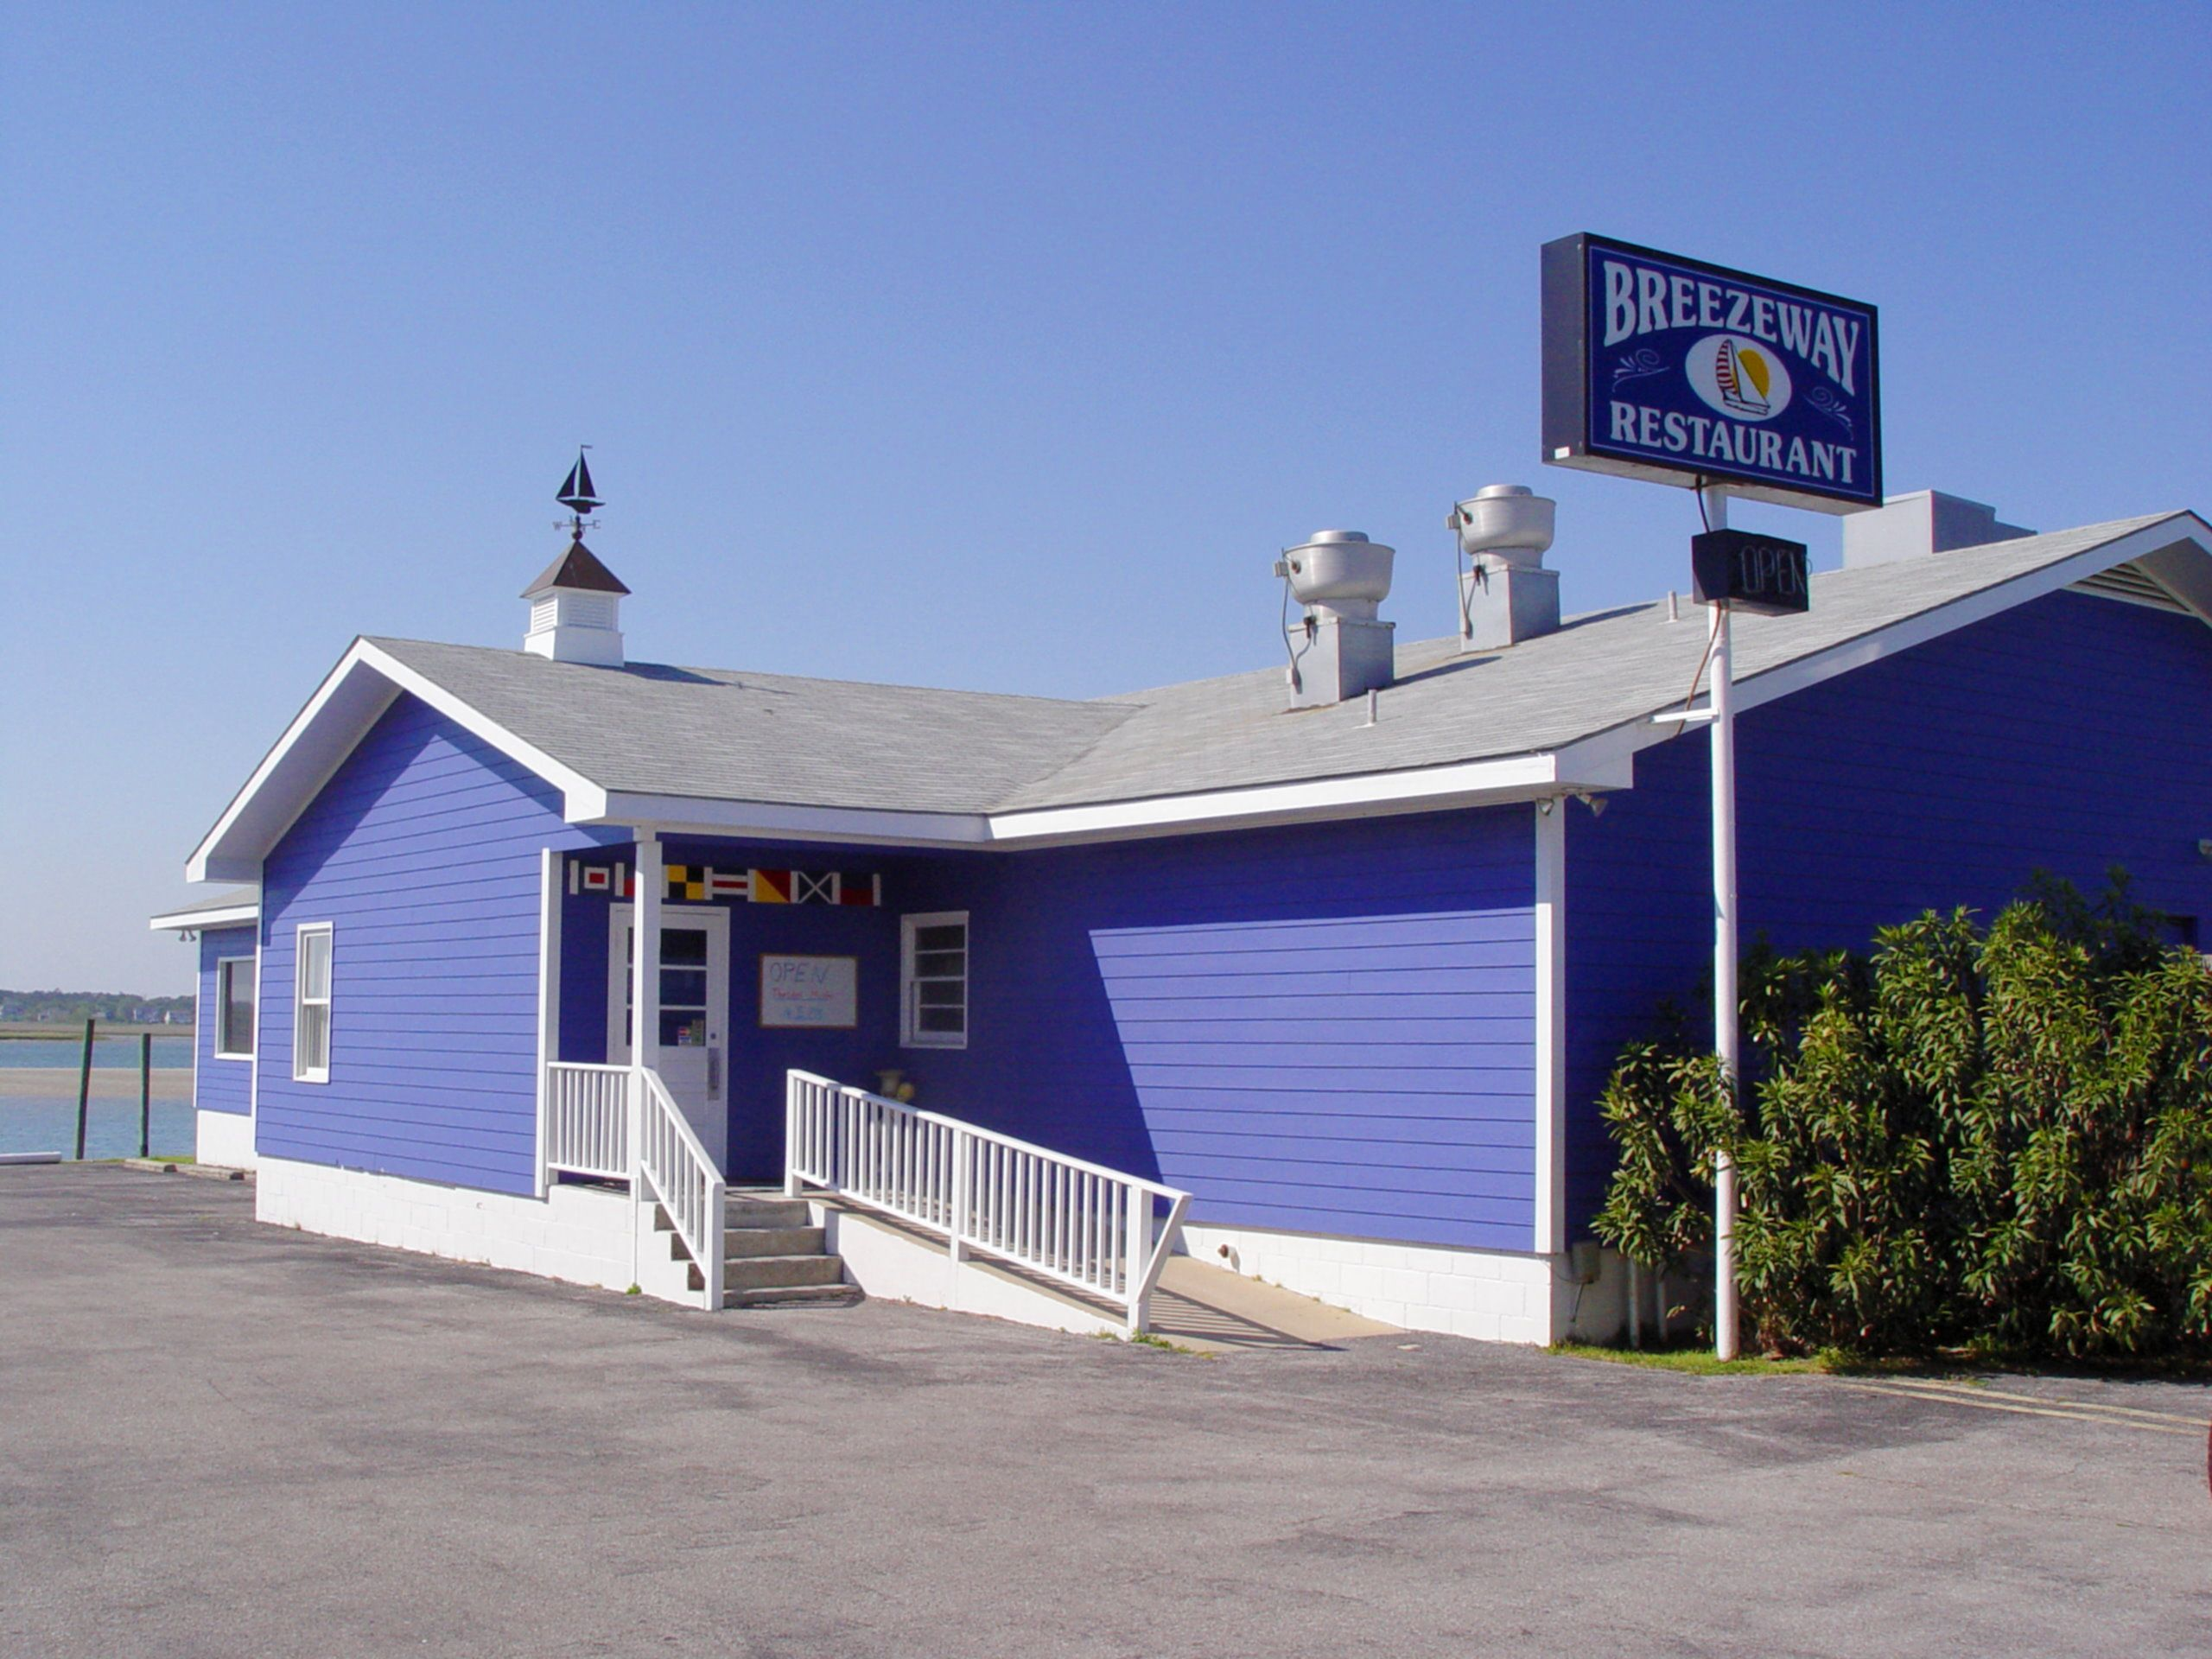 Breezeway restaurant topsail